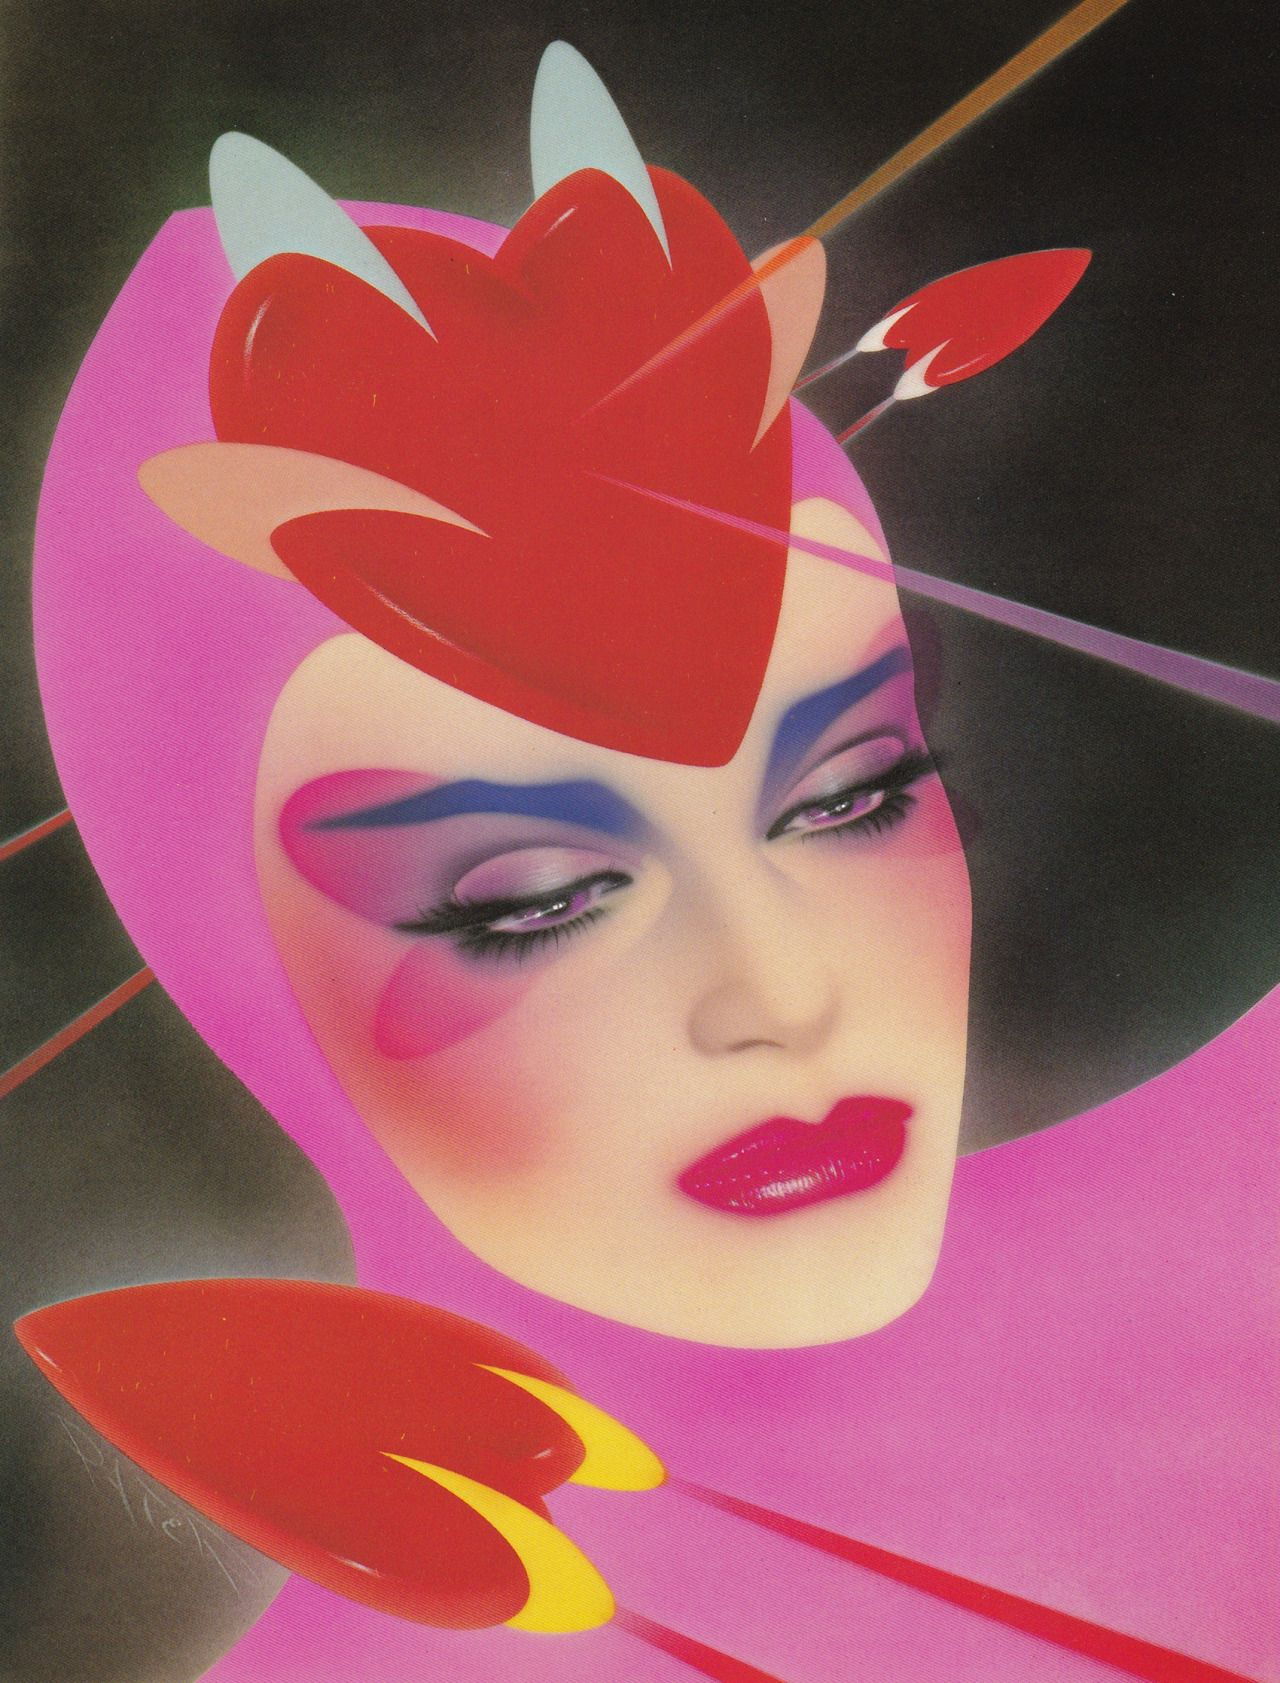 Pin by robert bruce design on 3 fun flyers art retro